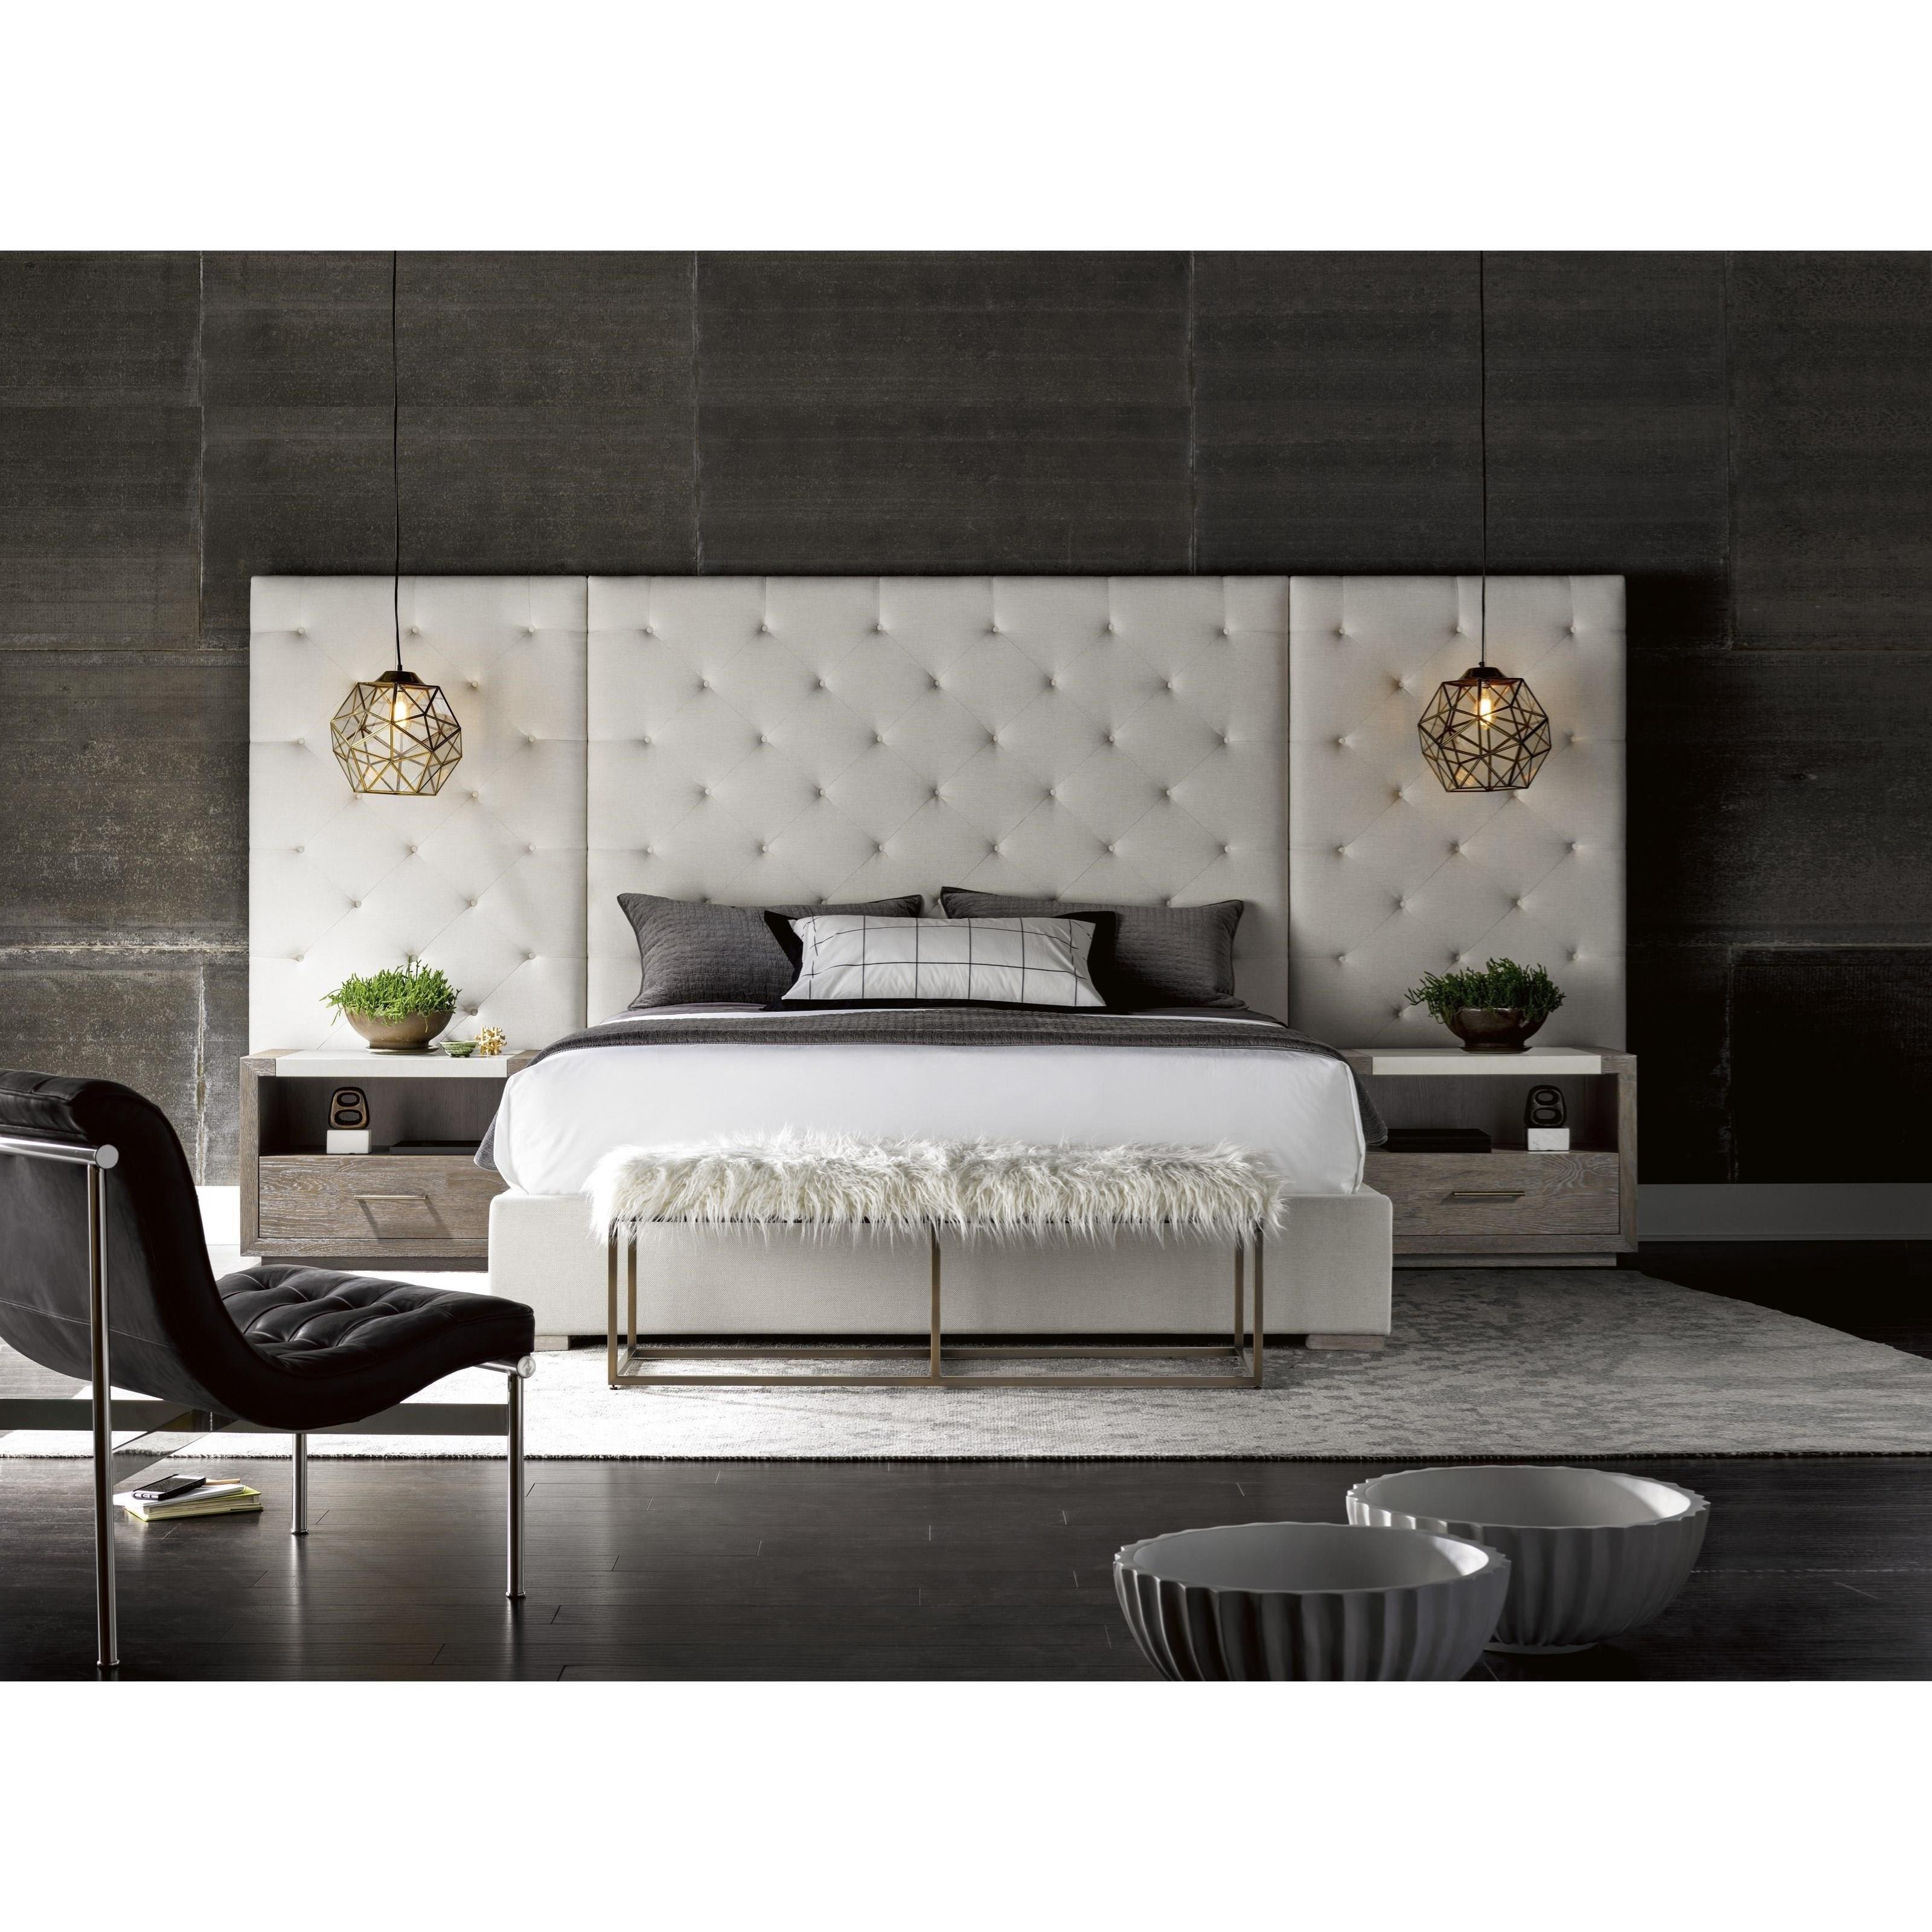 universal modern brando cal king bed with tufted panels. Black Bedroom Furniture Sets. Home Design Ideas